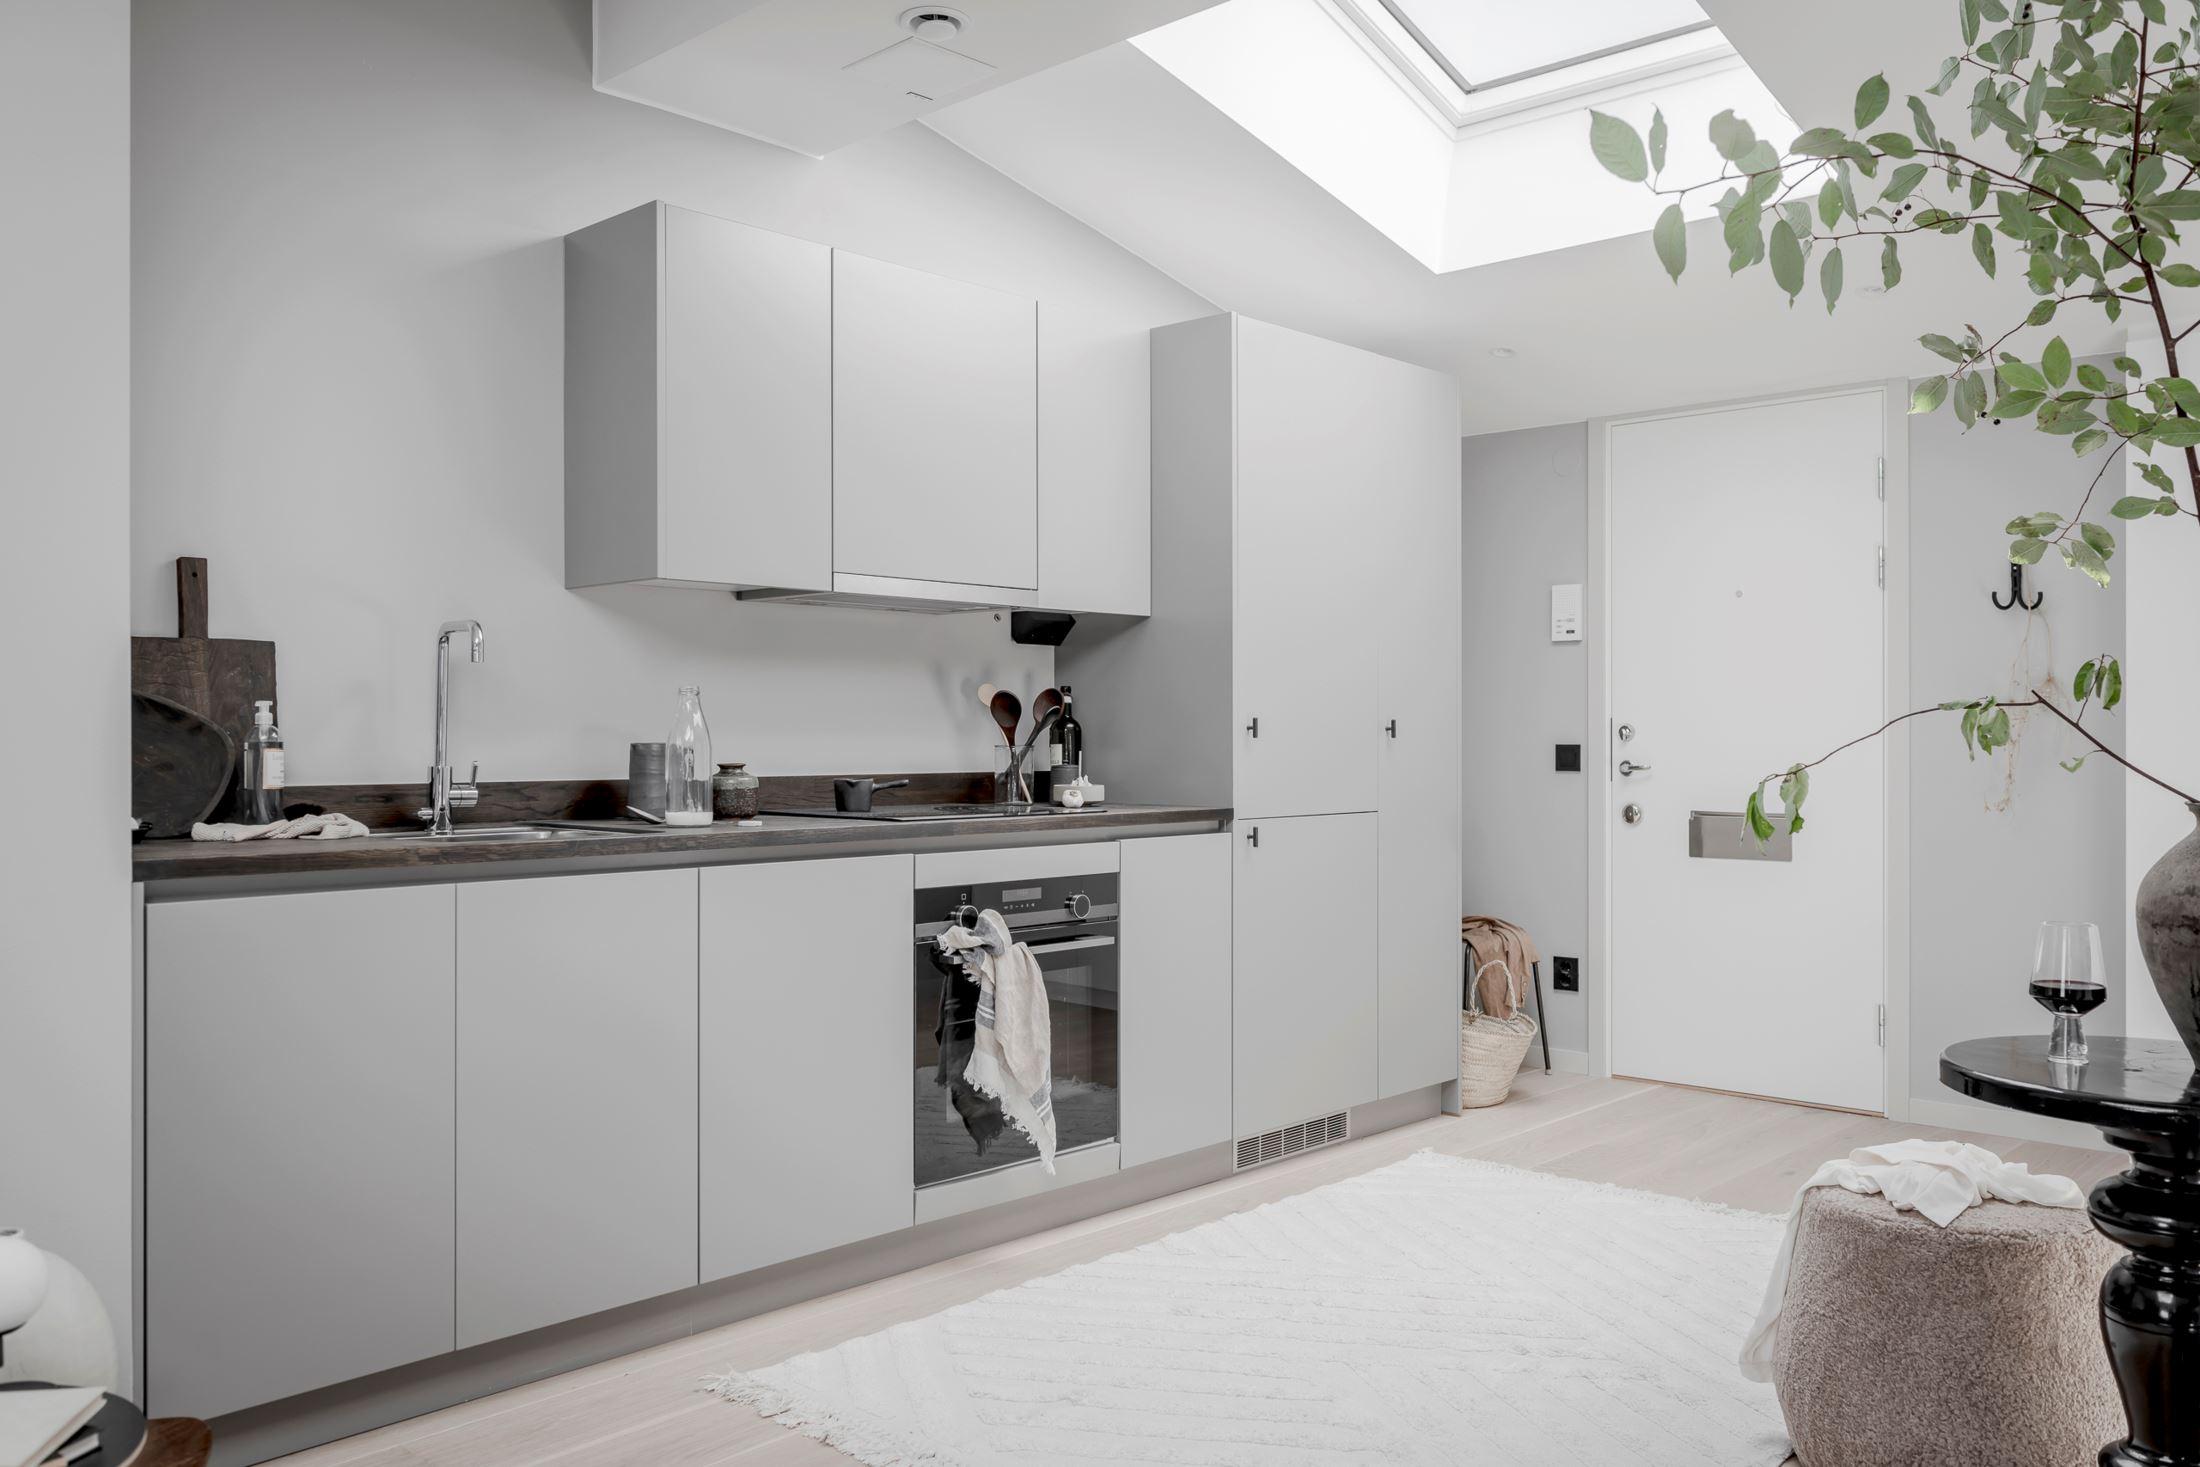 Plan deschis și decor nordic într o garsonieră la mansardă 35 m² 4